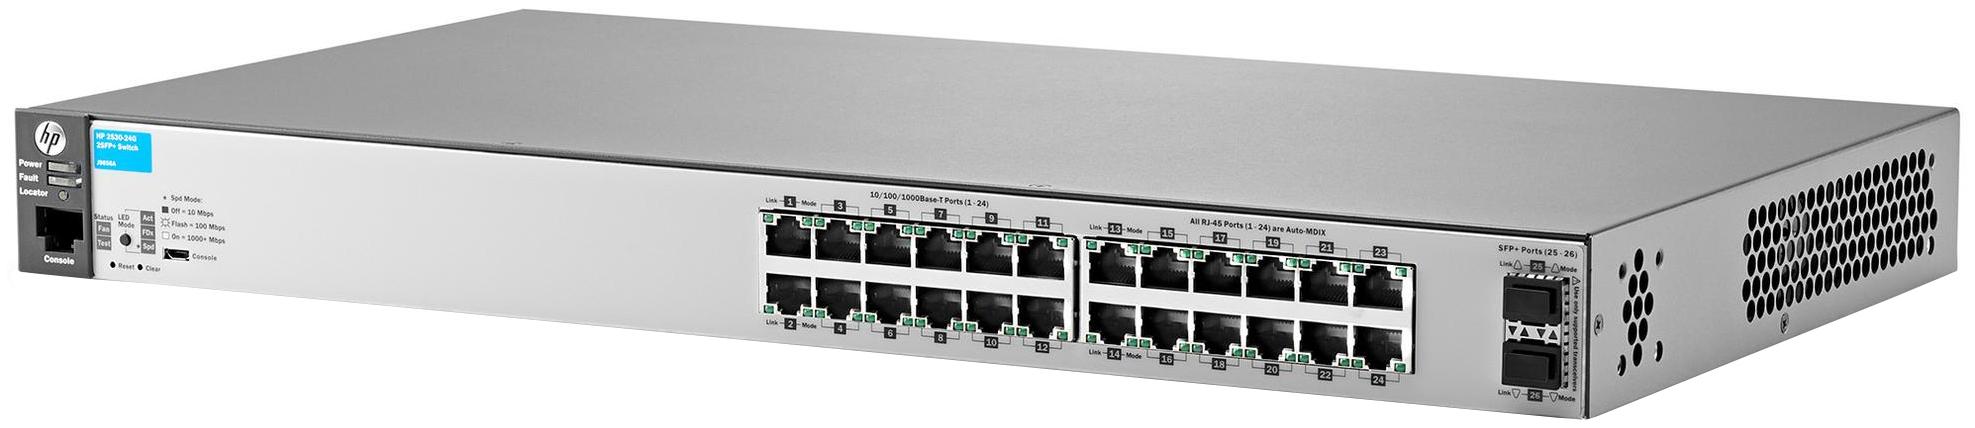 Коммутатор HP Aruba 2530-24G J9856A Серый